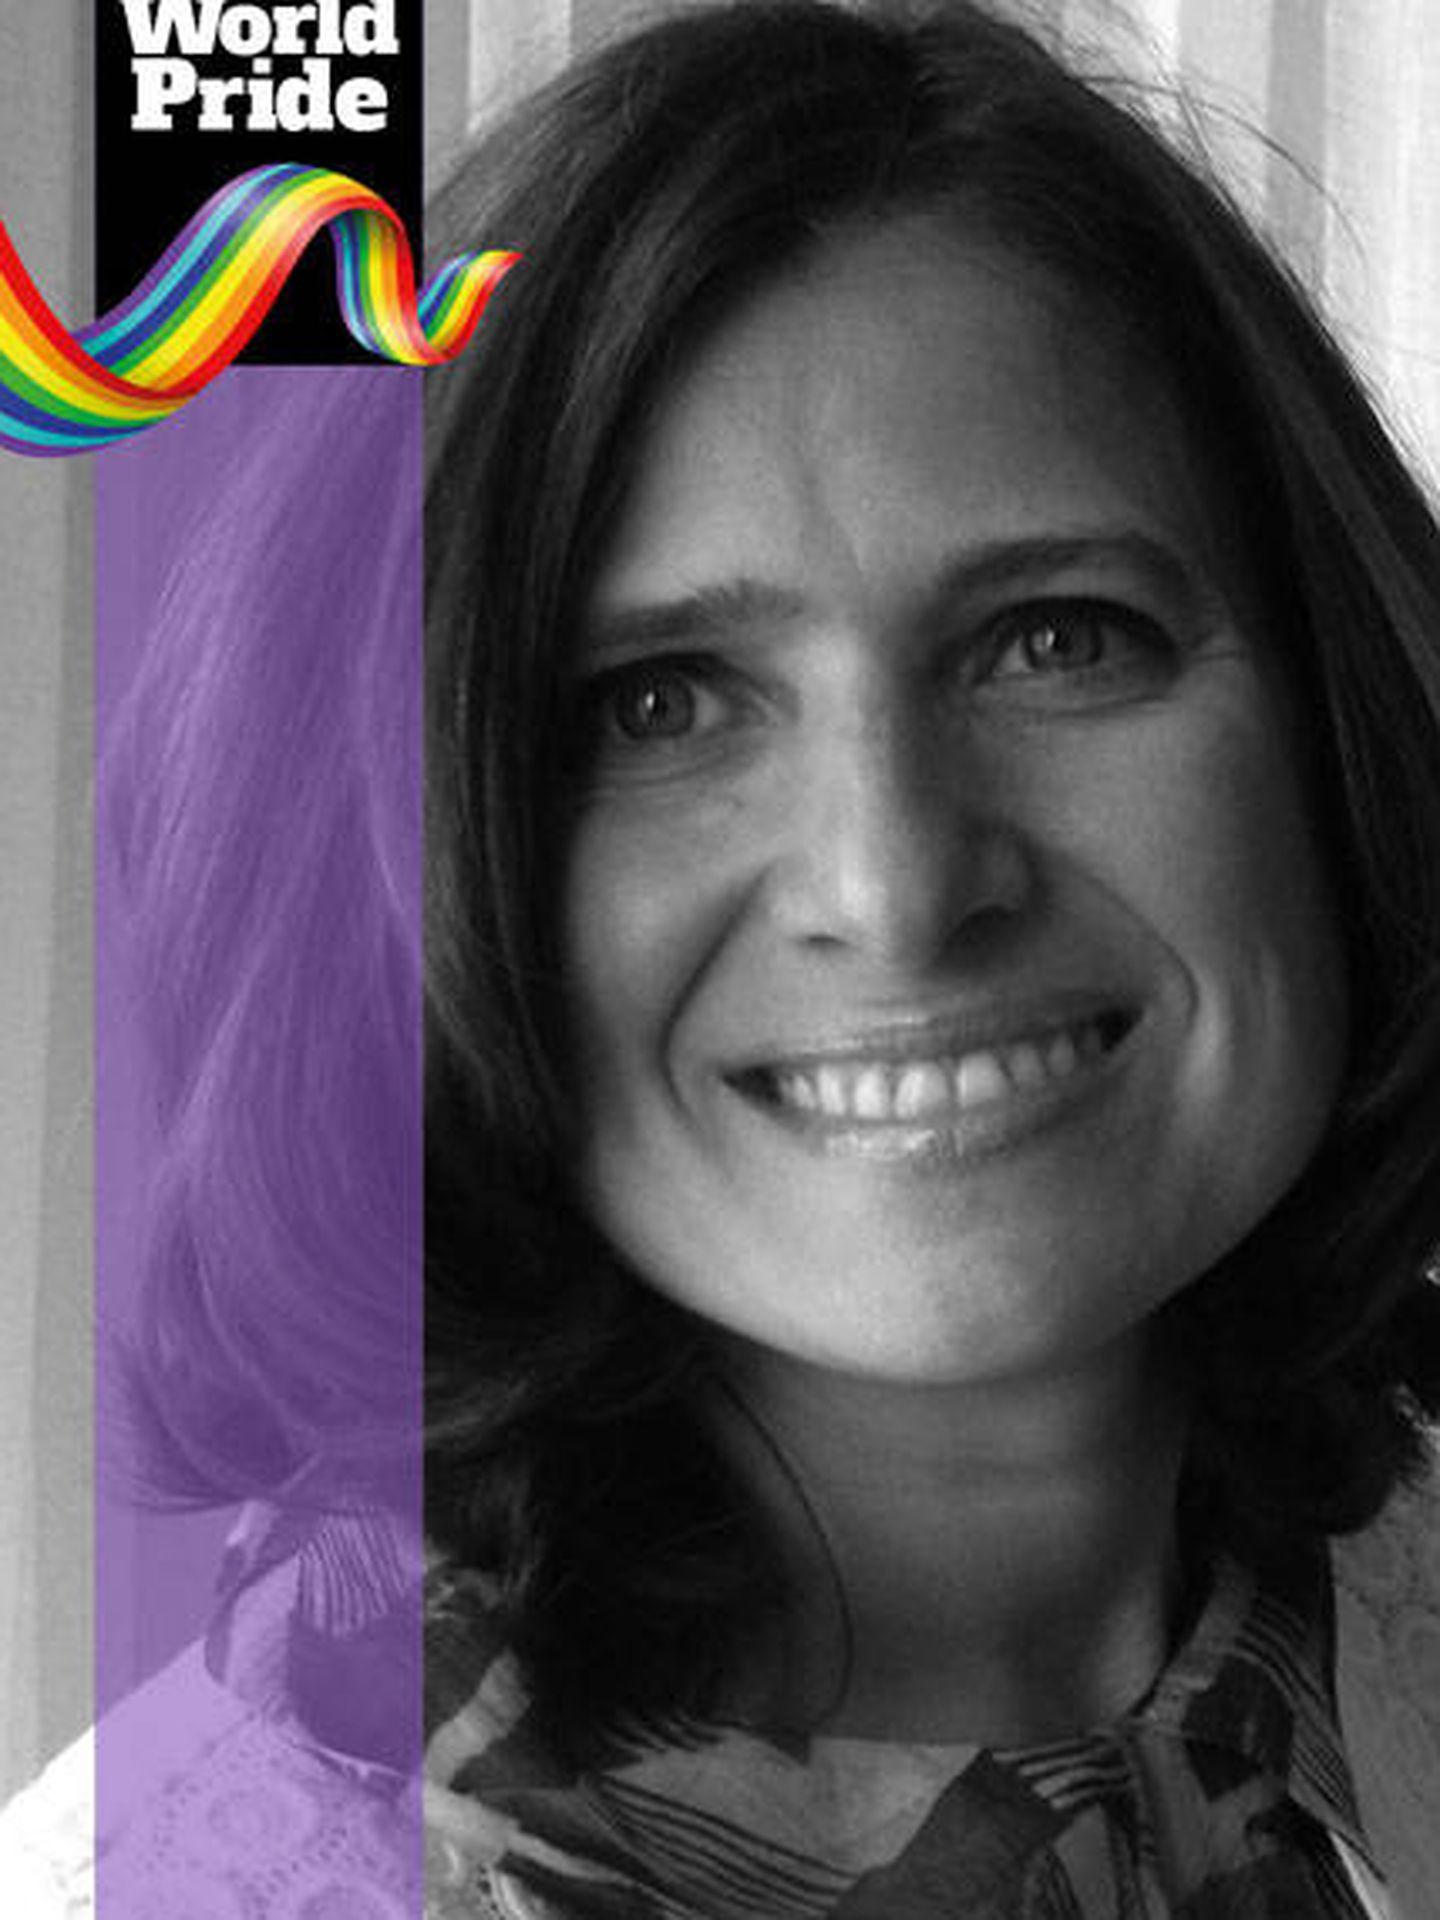 Orgullo LGTBI 2017: Margarita Alonso (Diversity)